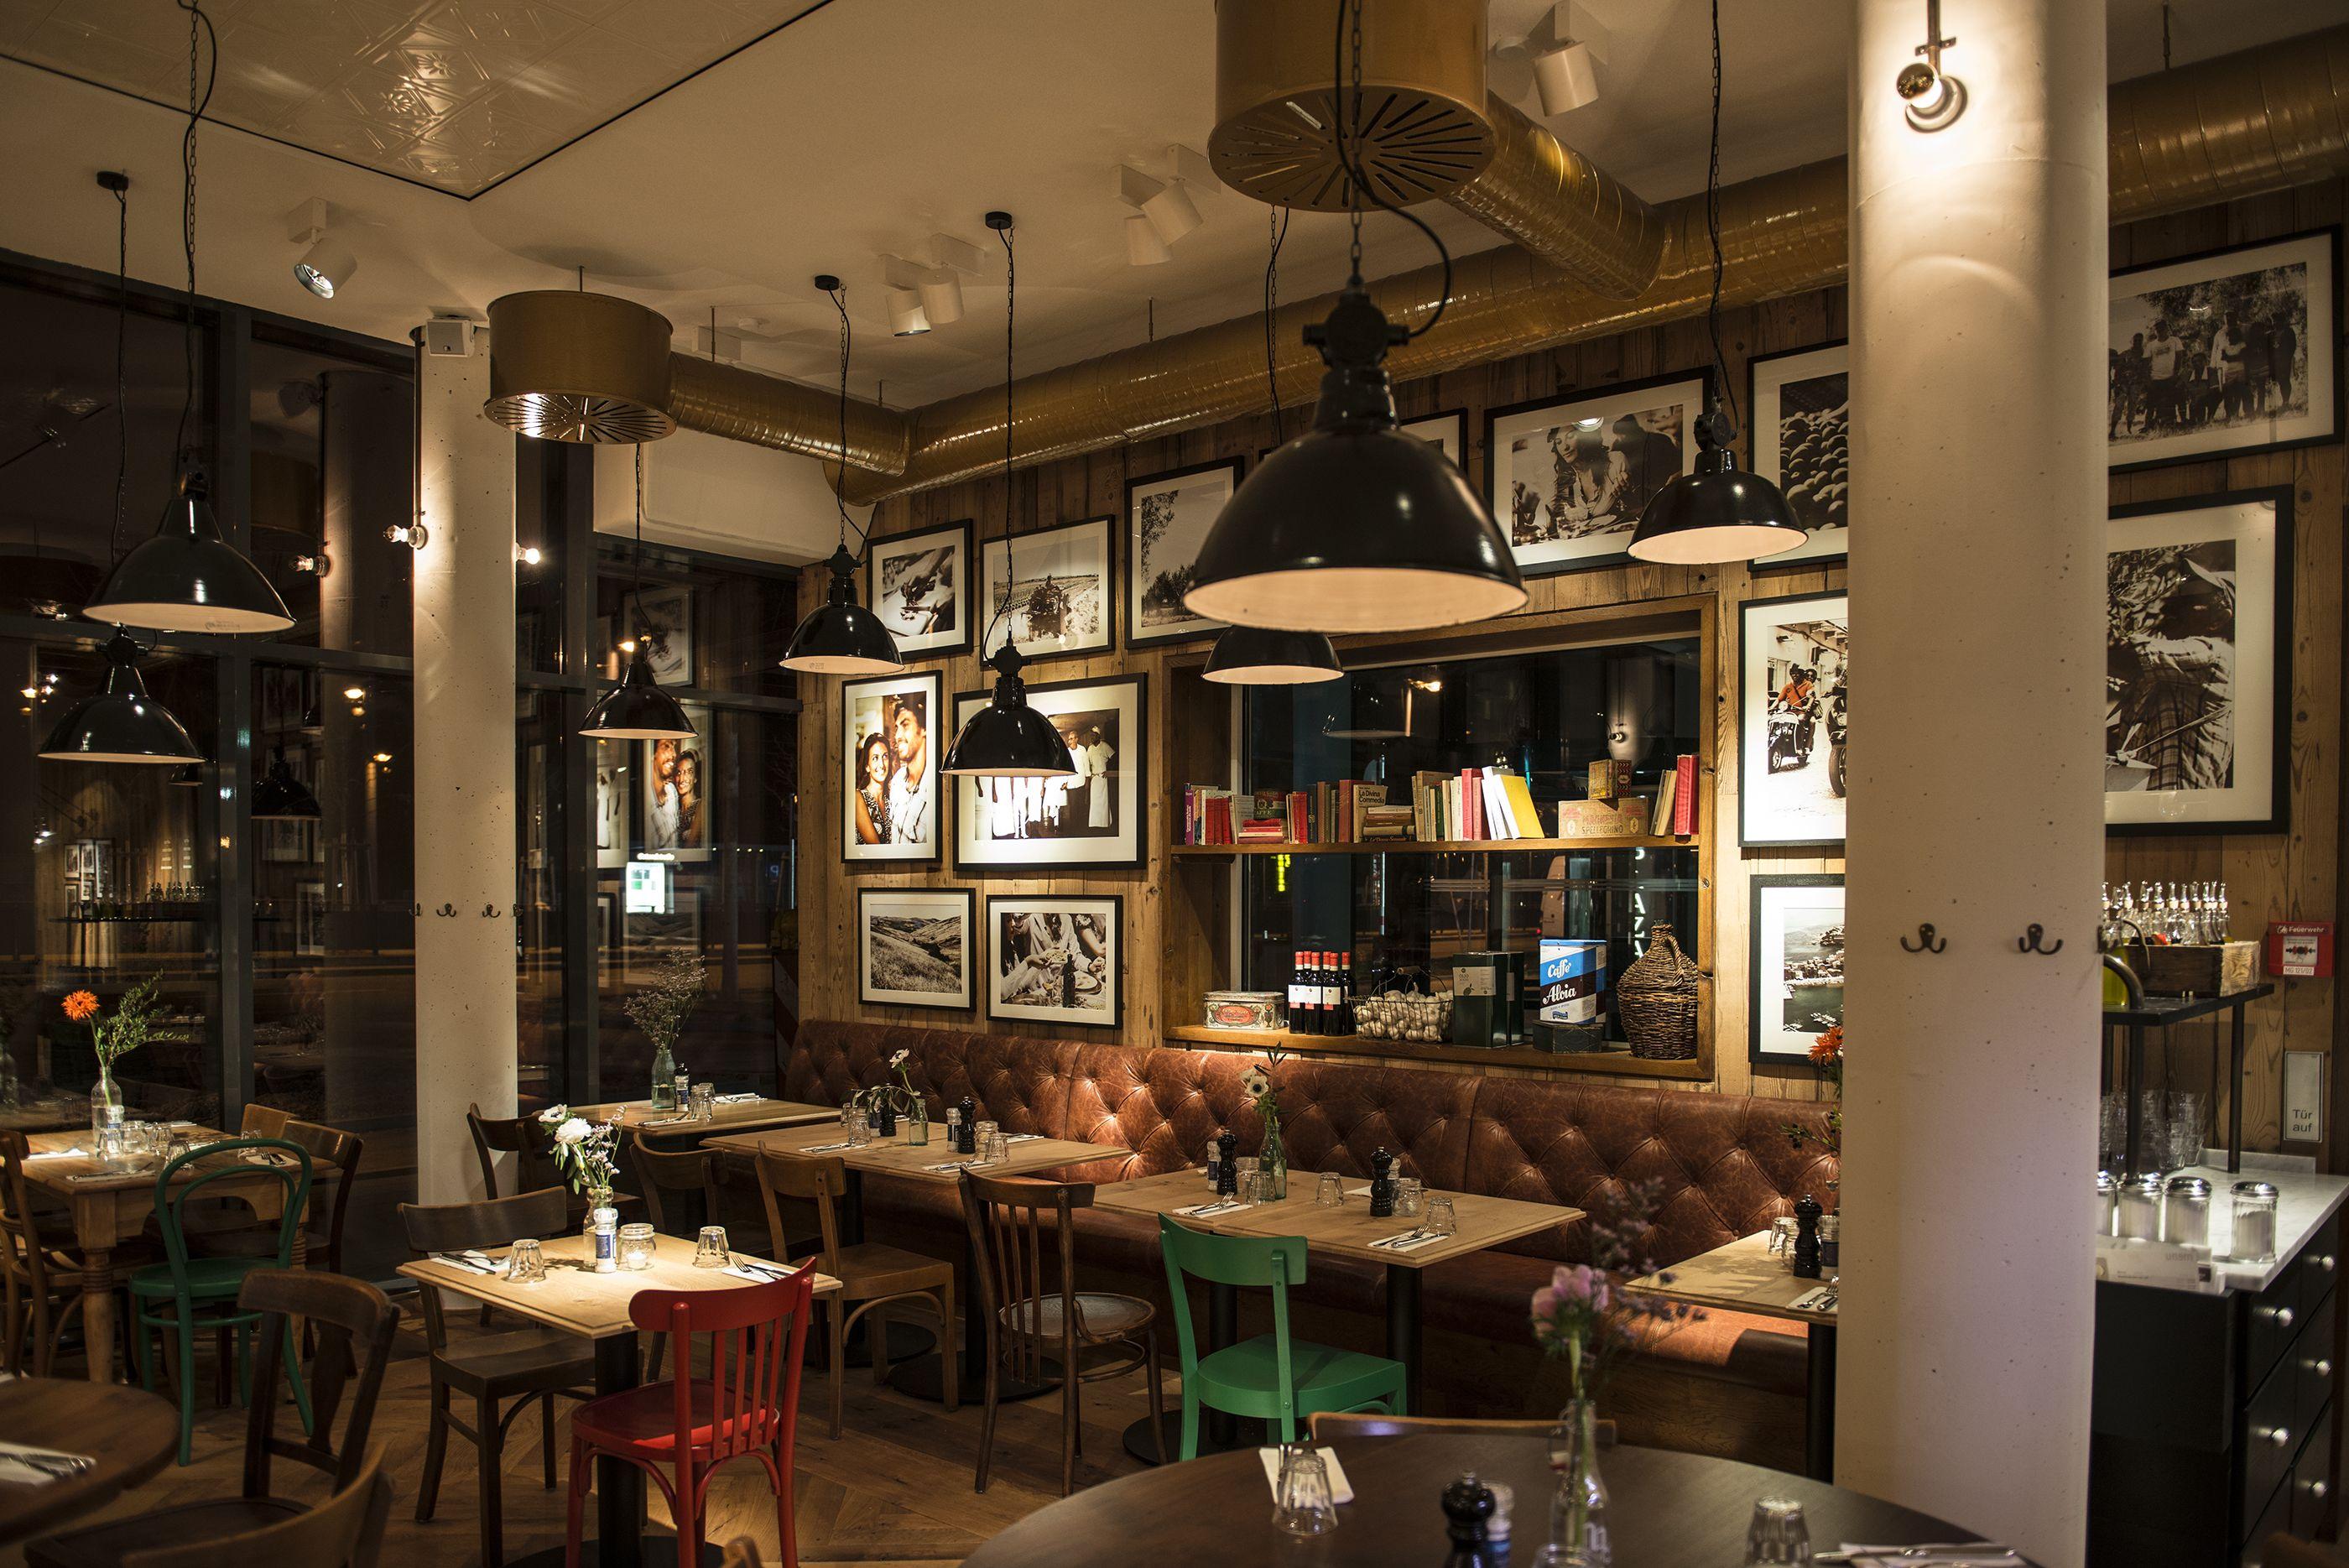 Restaurant Tialini Karlsruhe Karlsruhe Bar Interior Bar Design